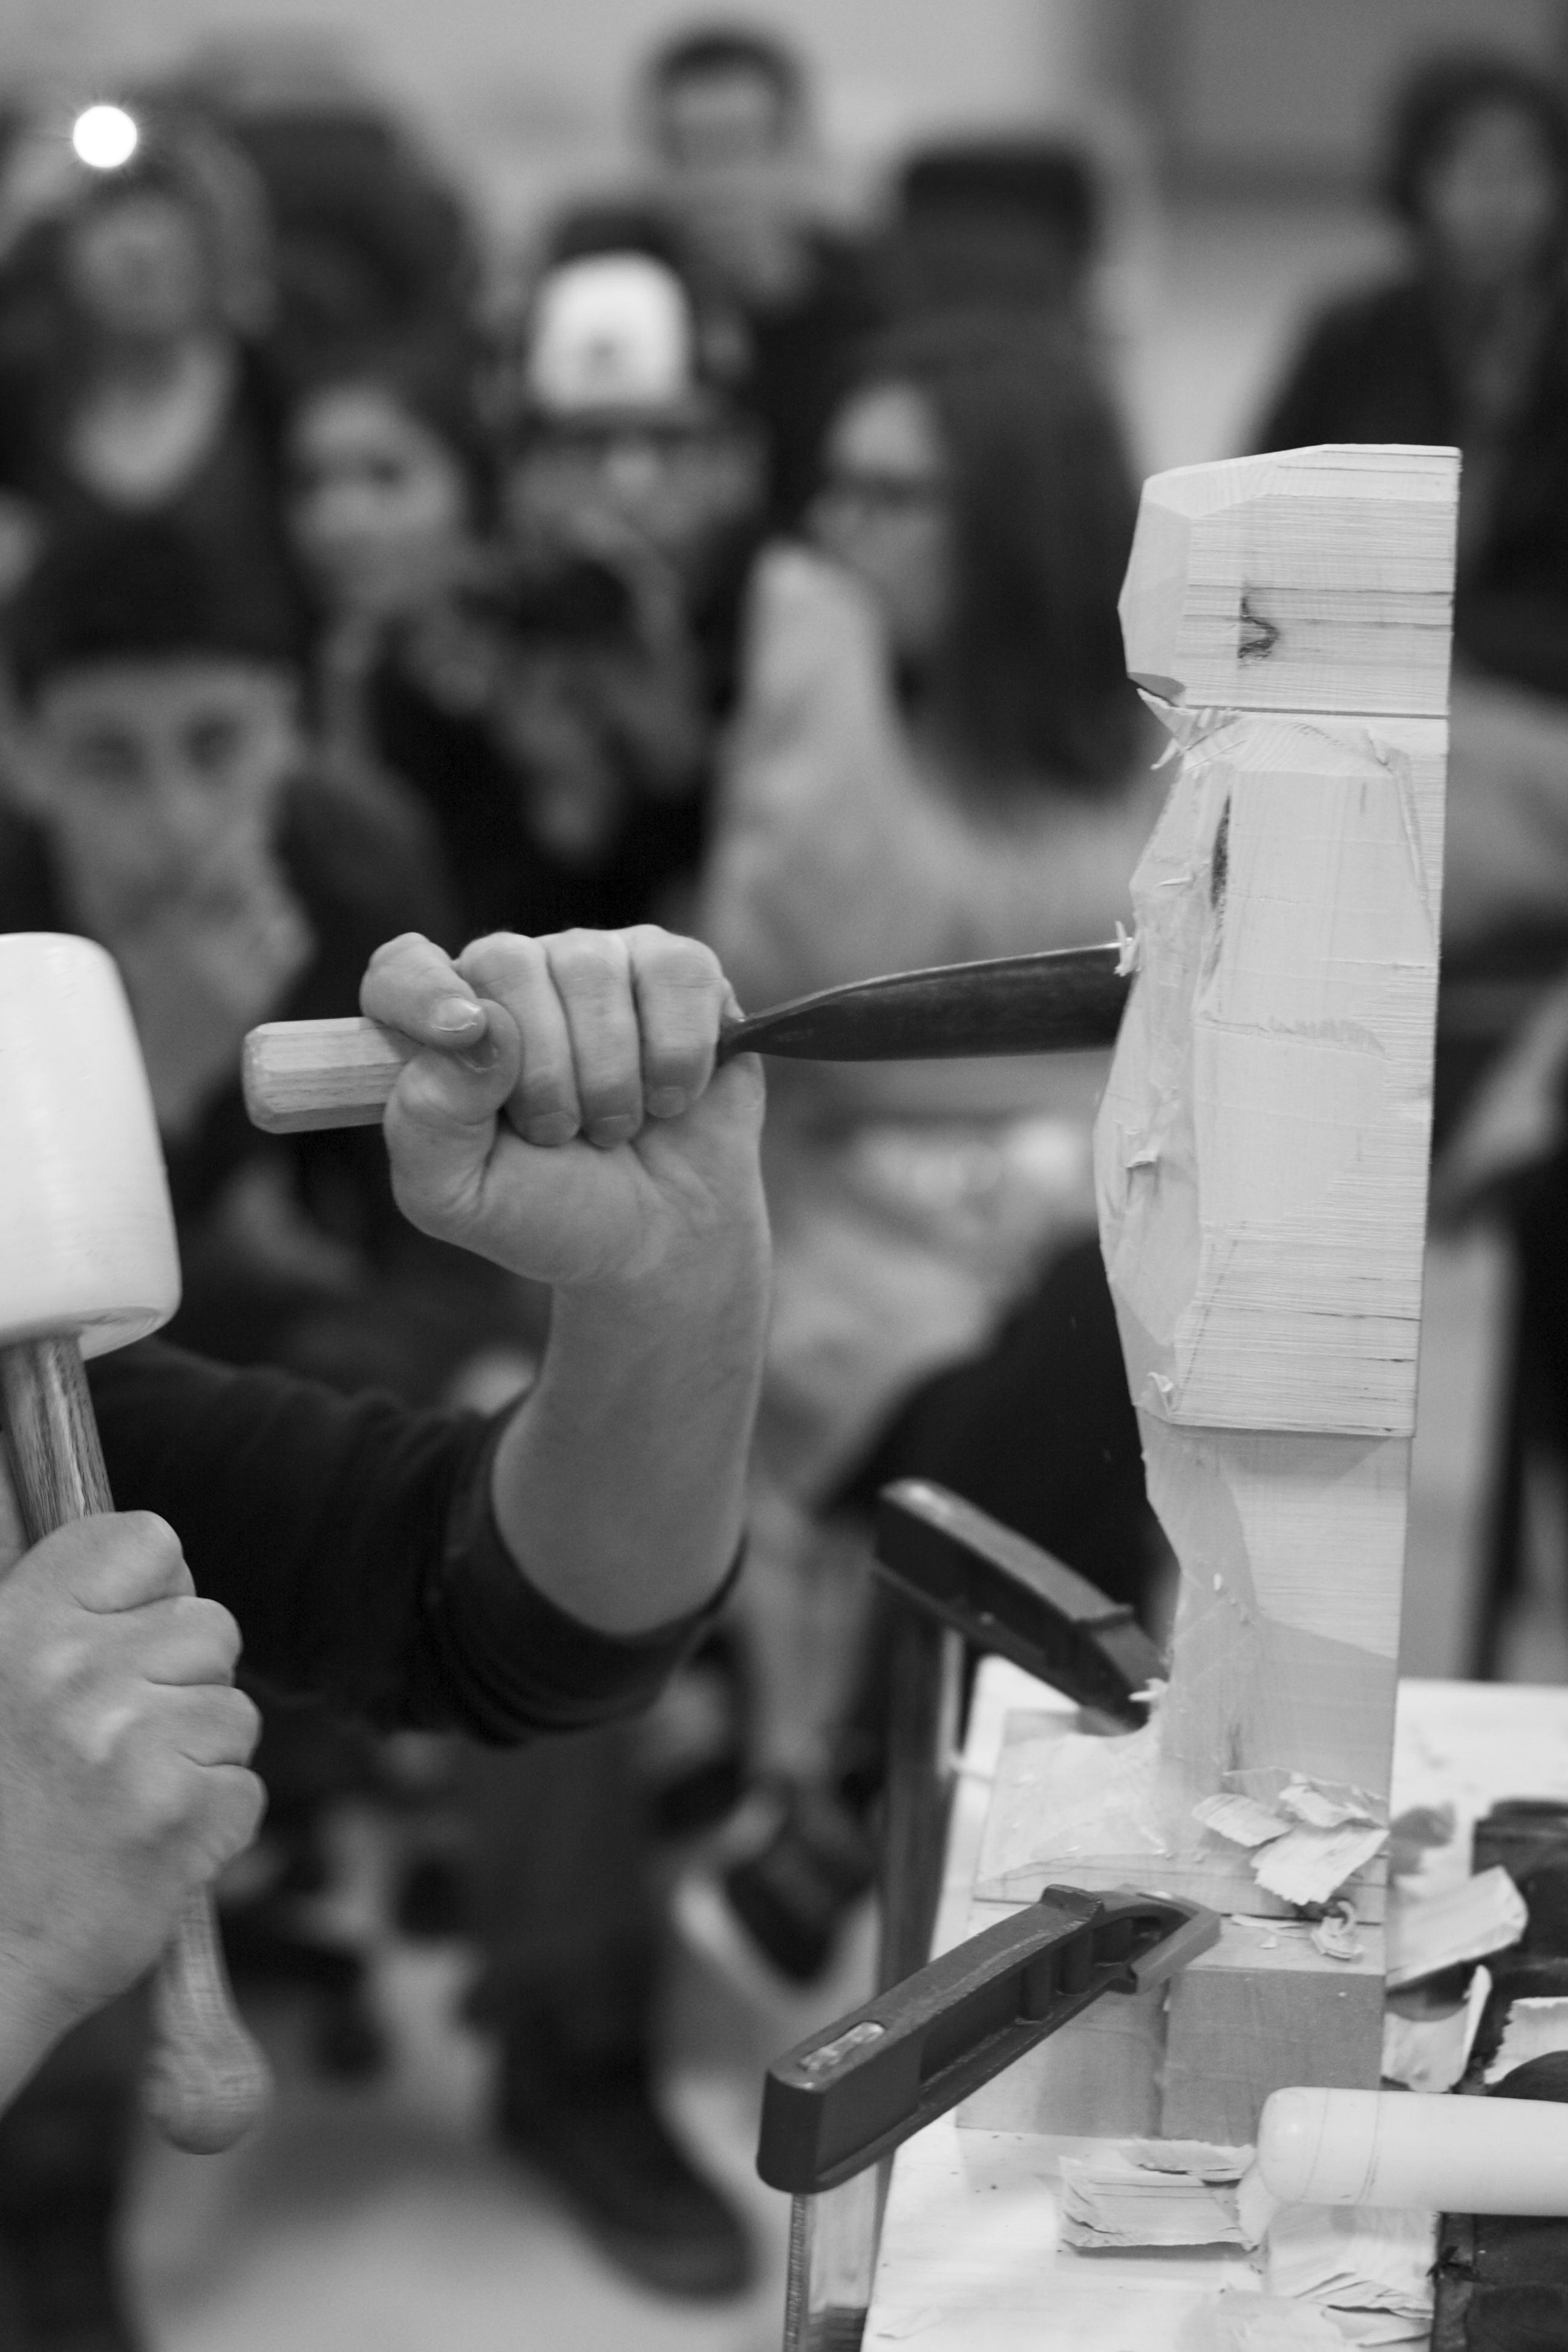 Flickr - Aron Demetz - Dialoghi e materia - Workshop a cura di Franco Reina67